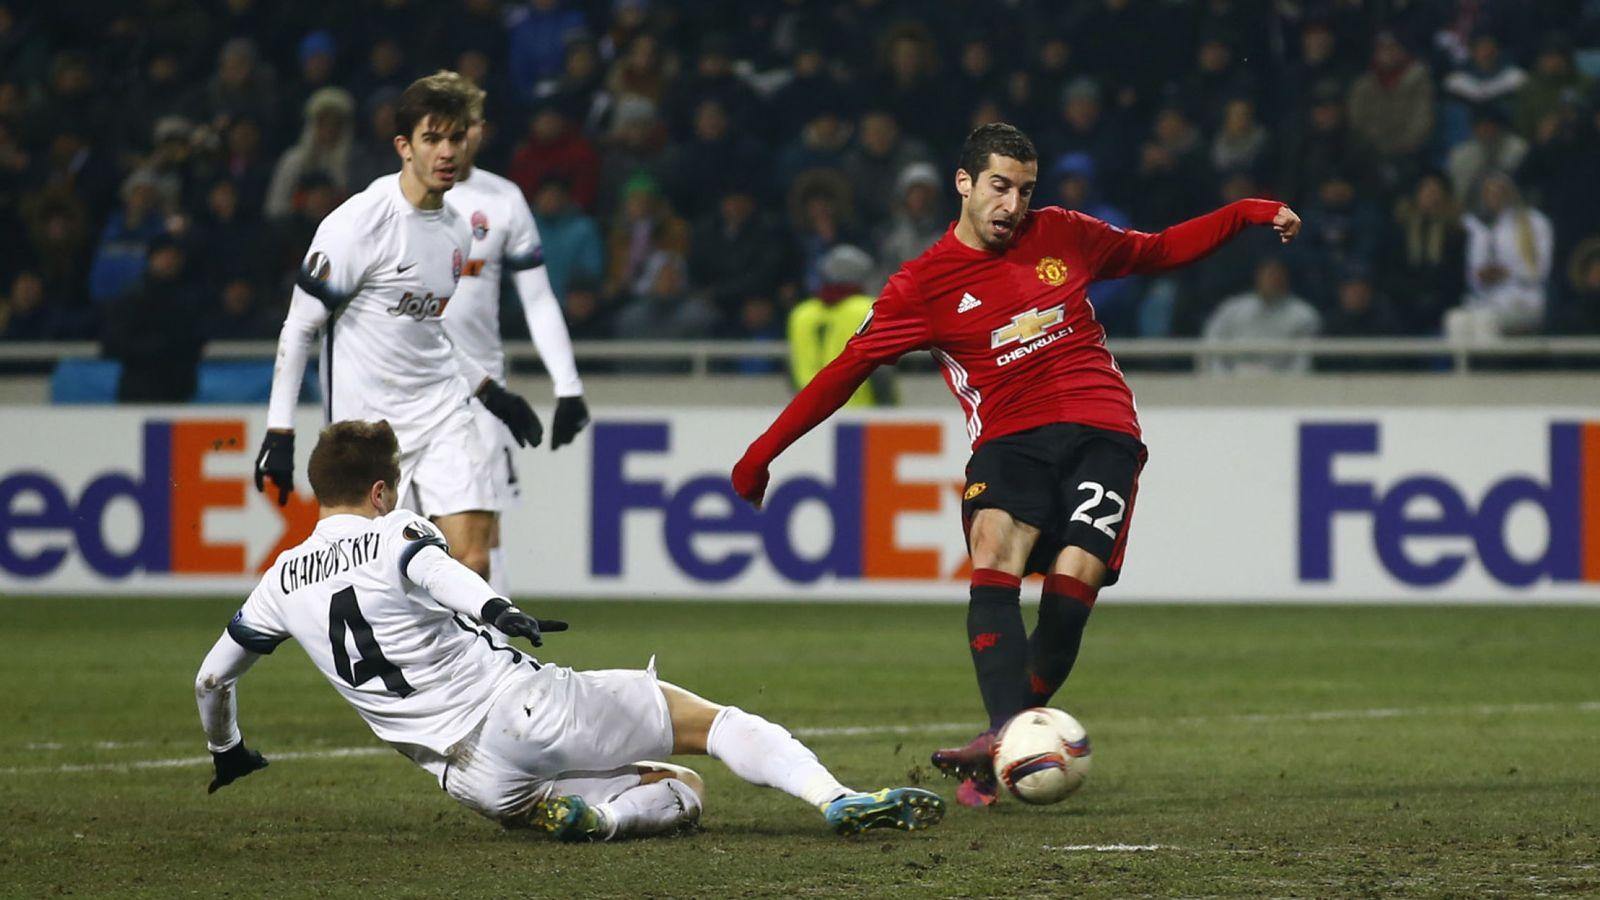 Foto: Mkhitaryan marca un gol con el Manchester United en la Europa League. (REUTERS)